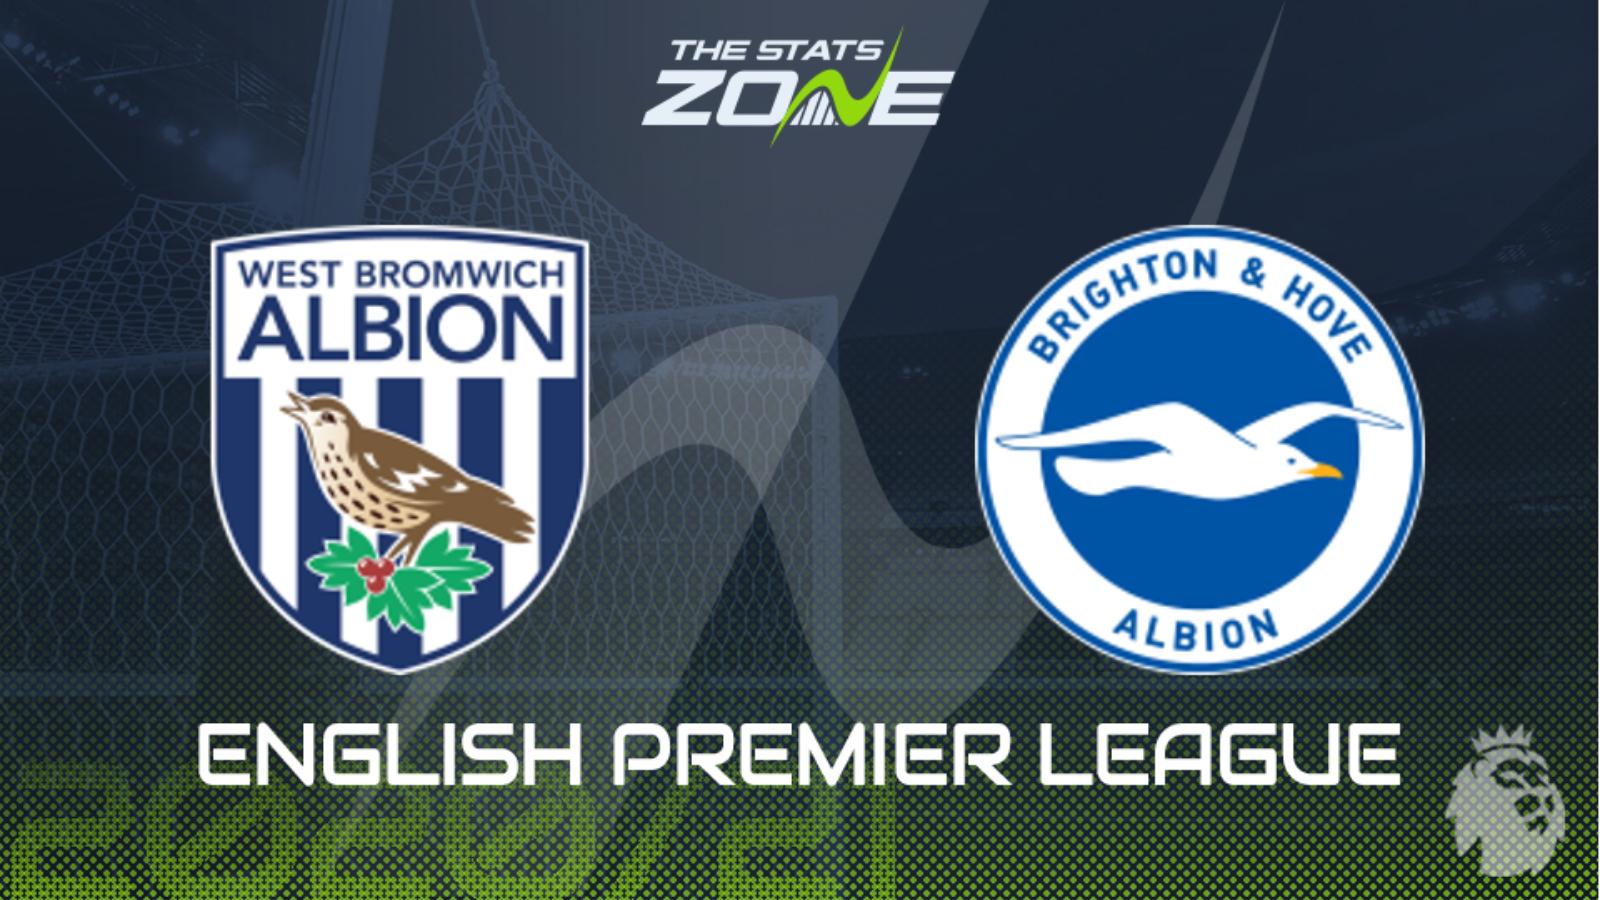 West Brom vs Brighton Highlights – Premier League 2020/21